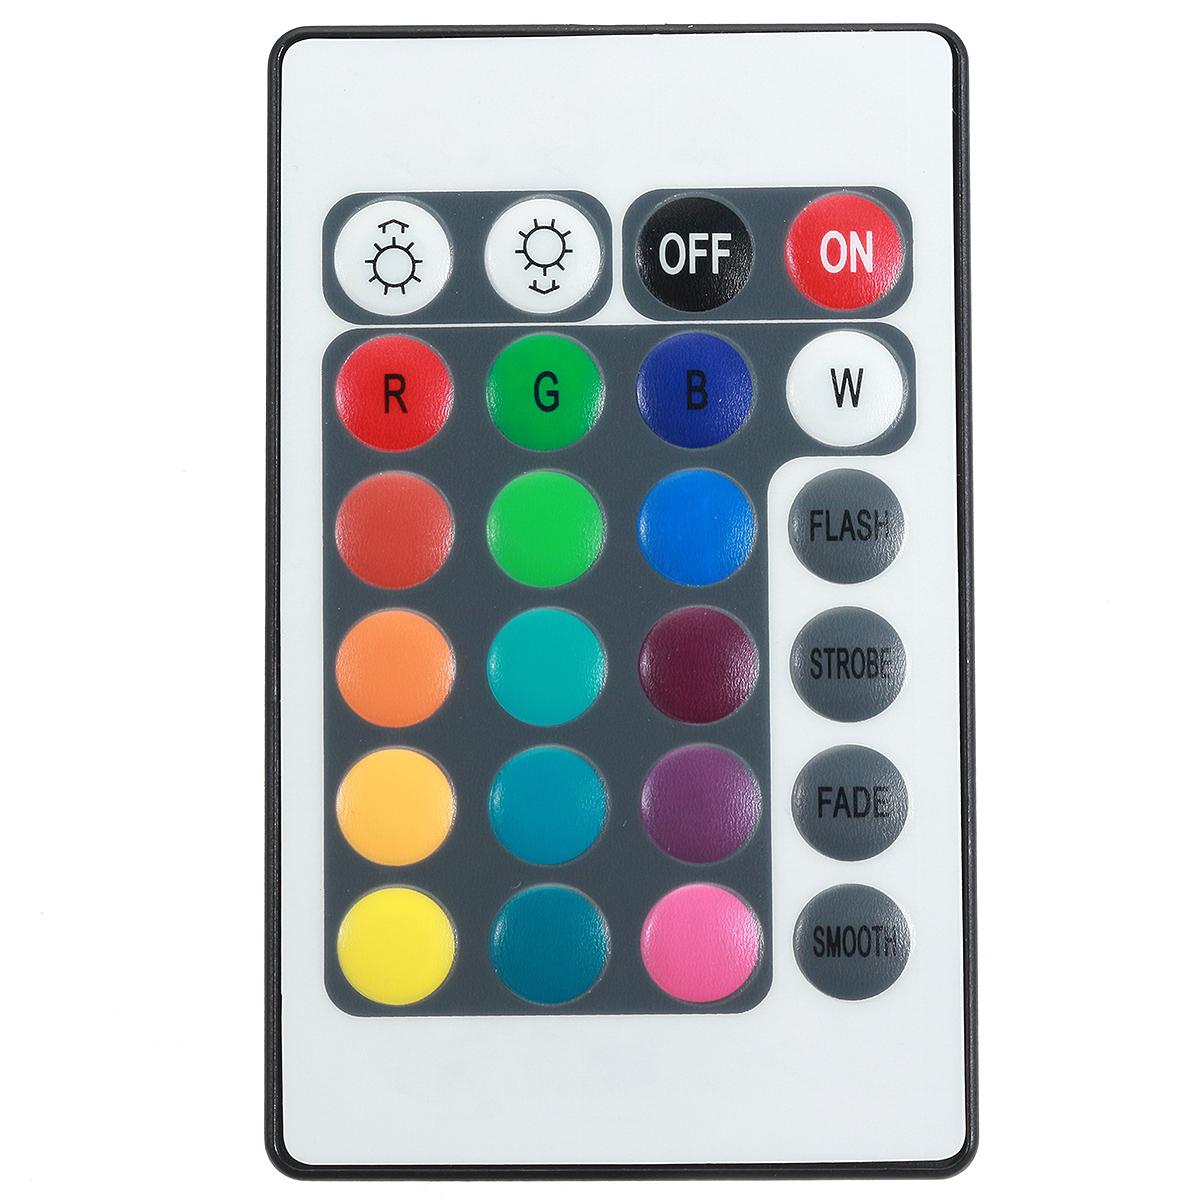 DC12V 2*5M Non-waterproof SMD2835 Smart WIFI Alexa Google Home Control Flexible